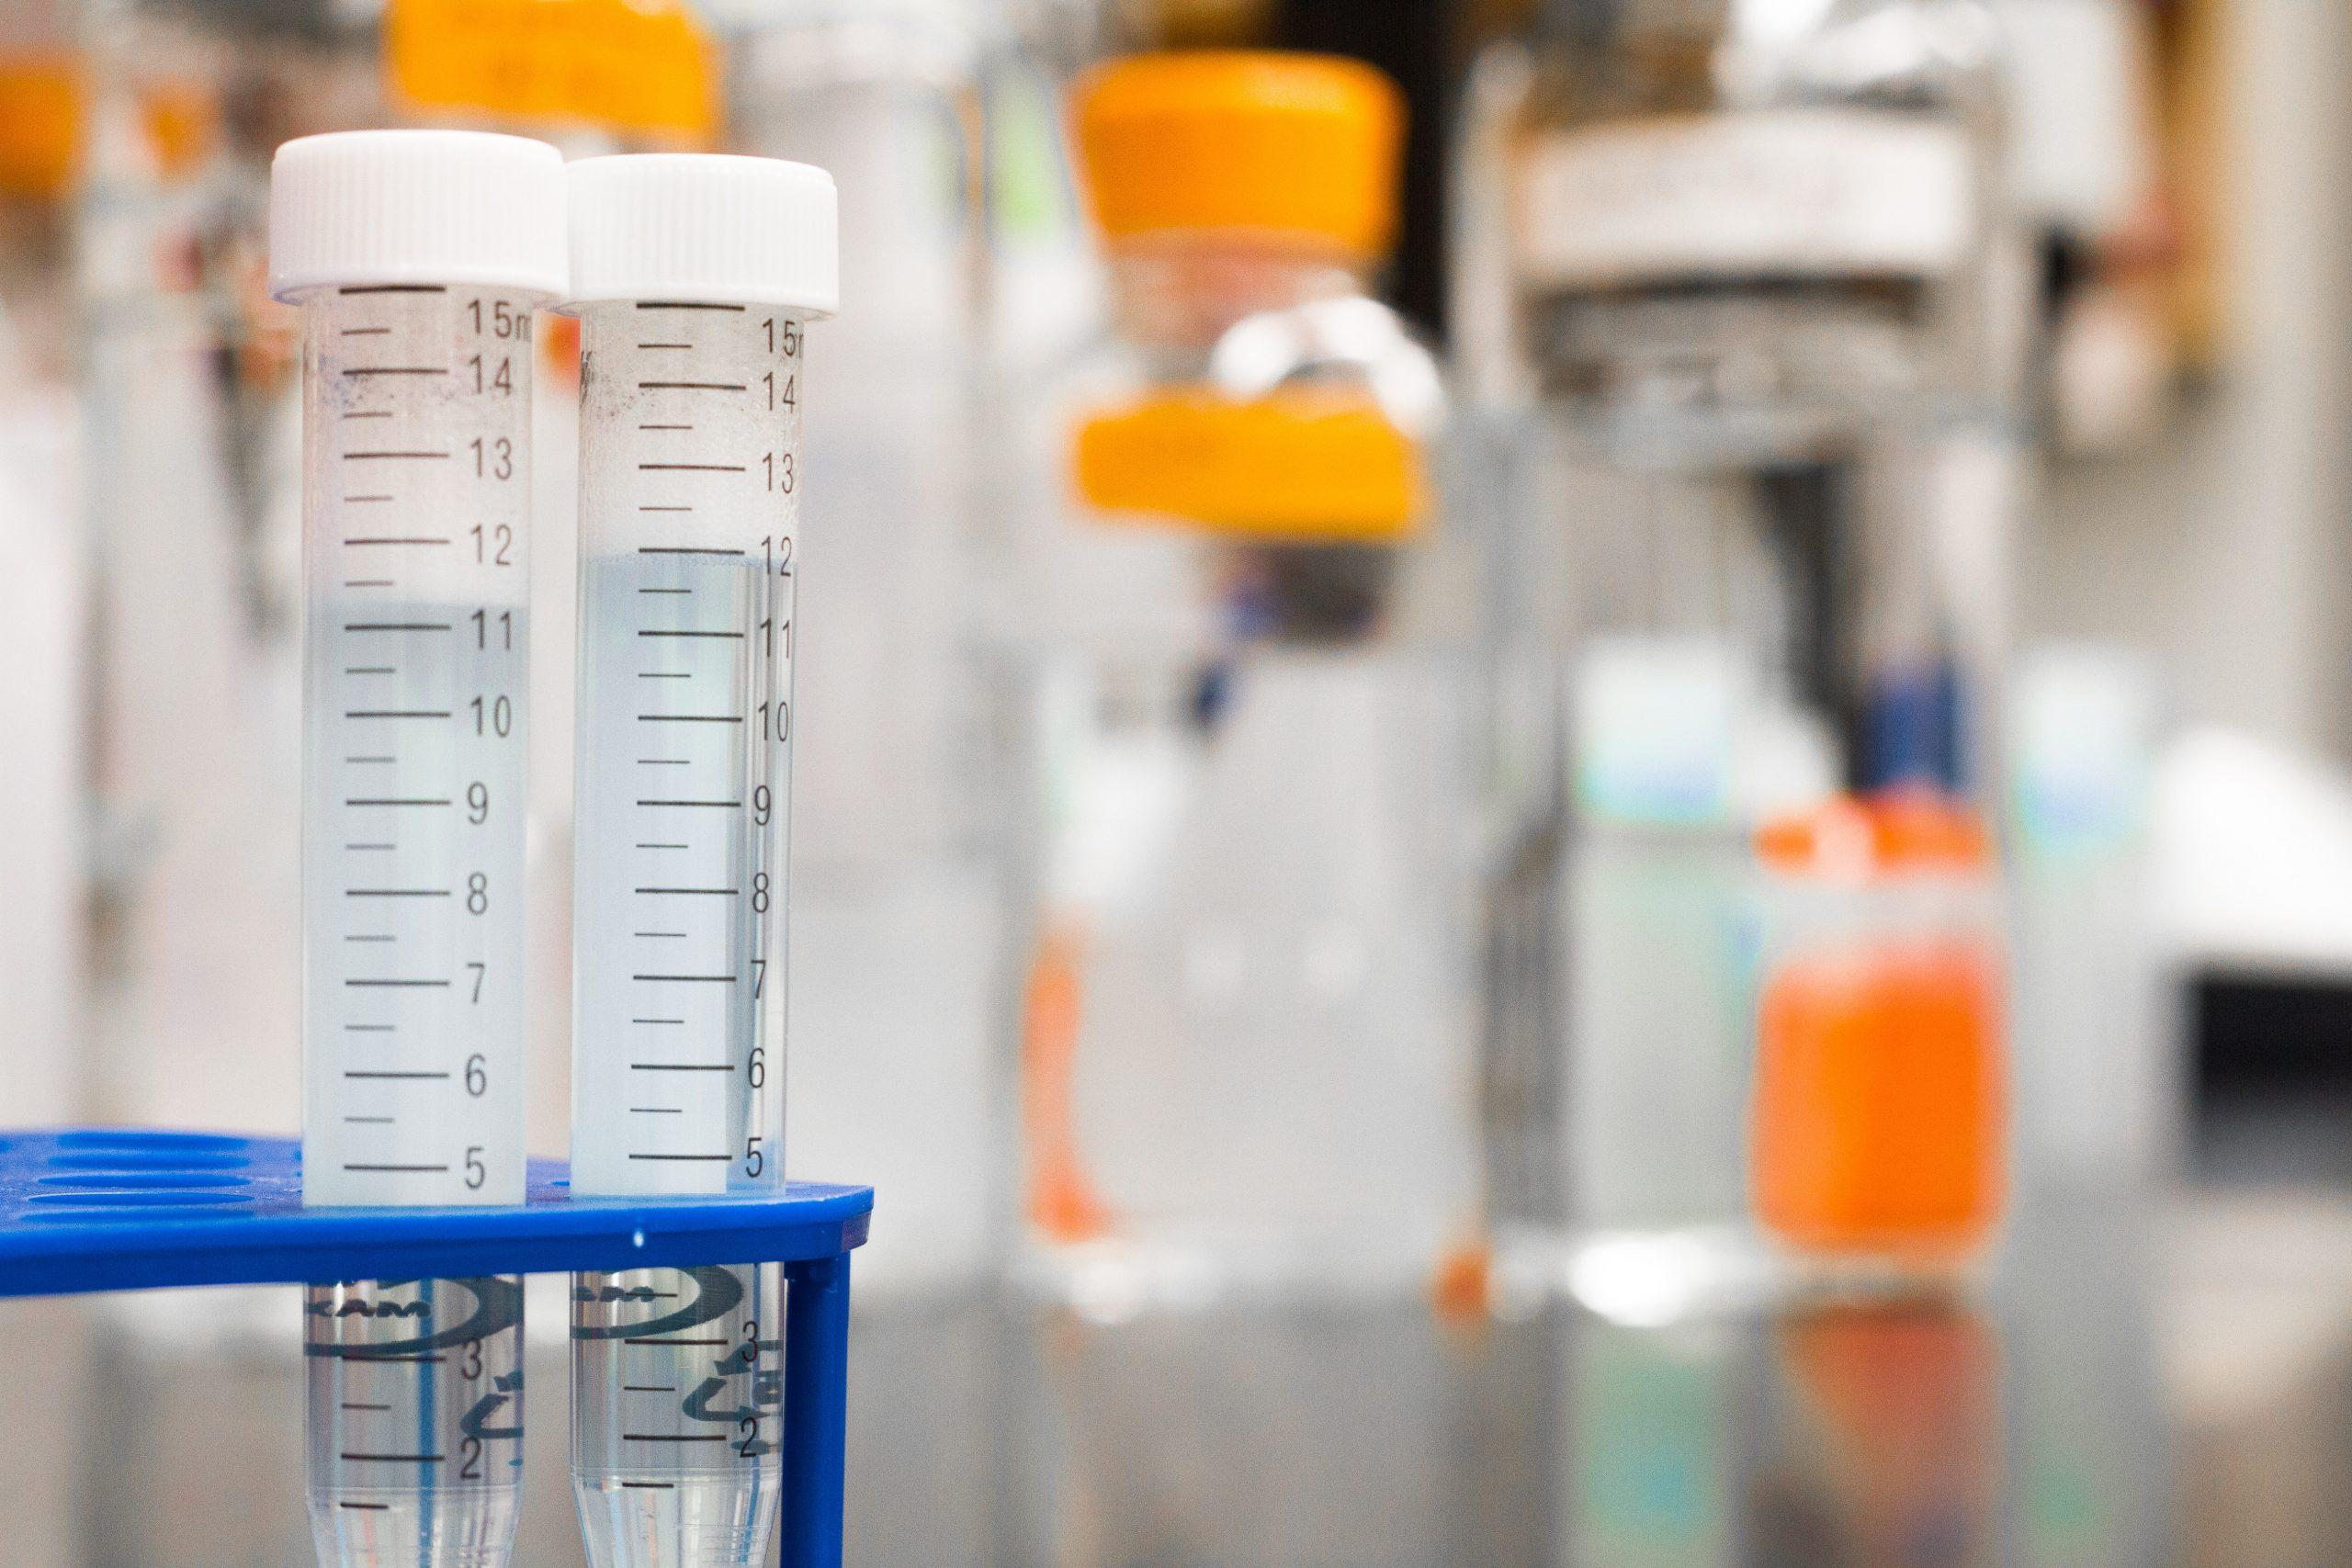 Centroamérica toma precauciones por coronavirus en China